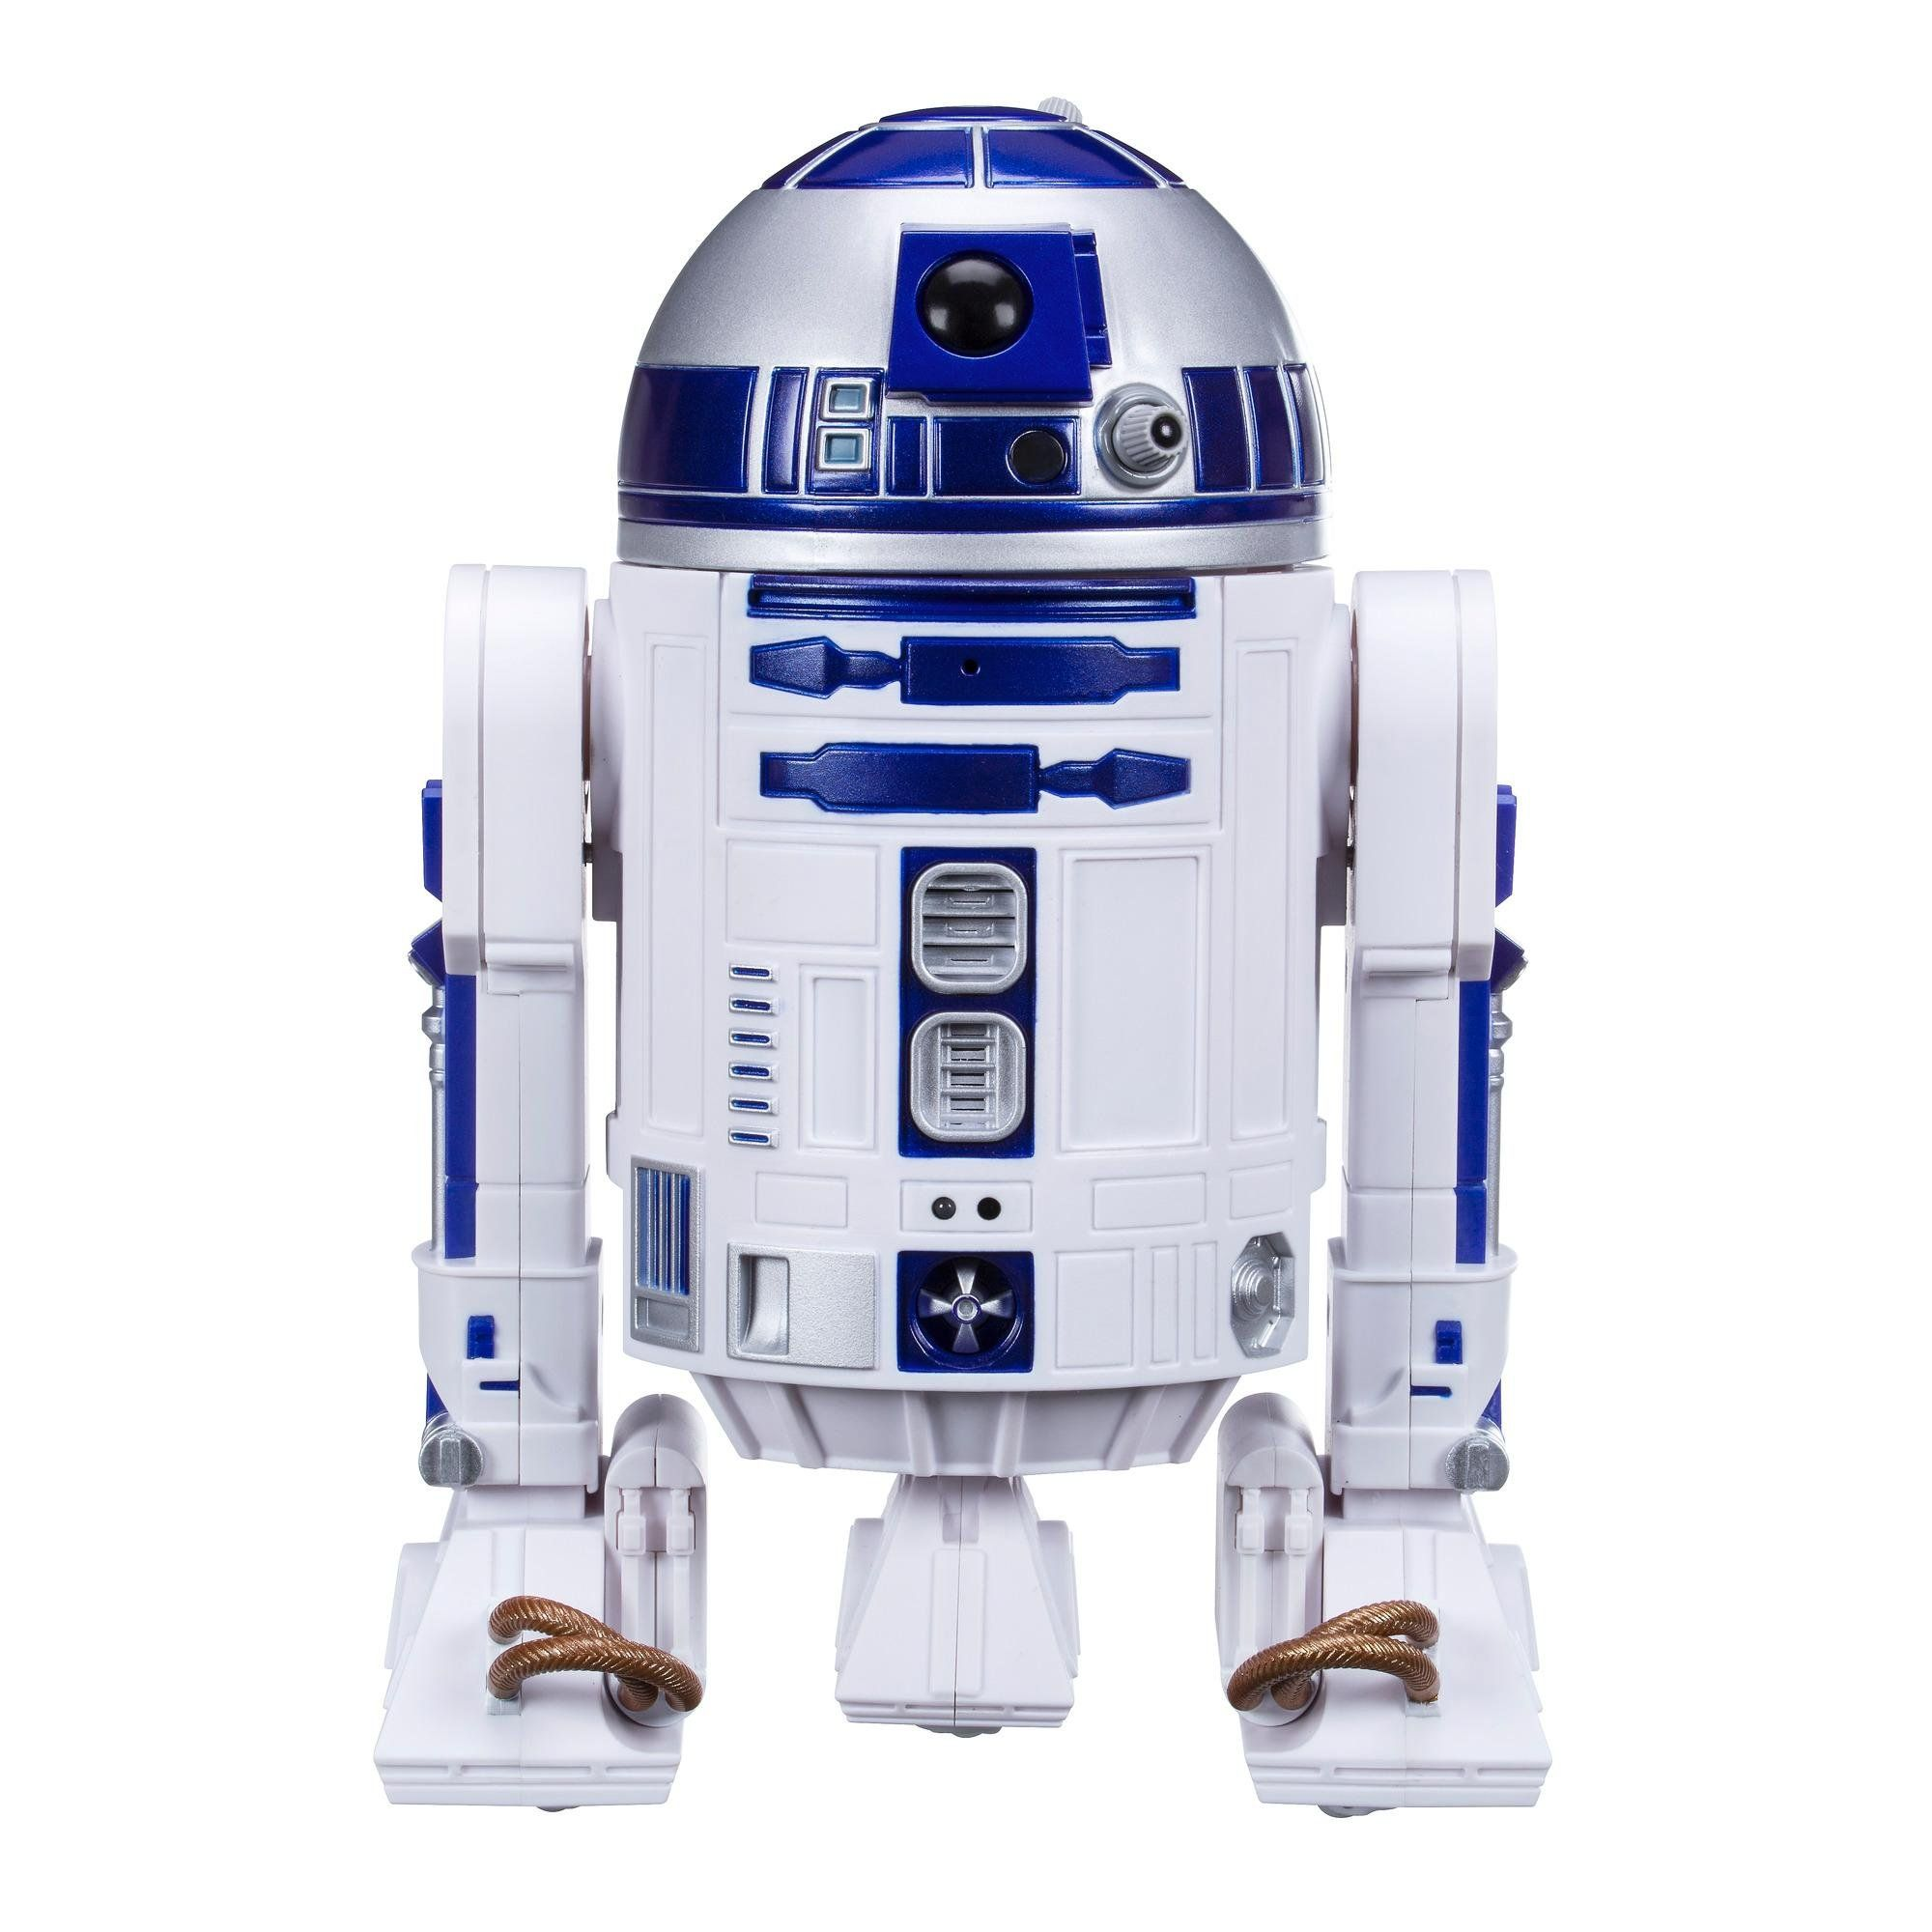 Boneco R2-D2 (18 Cm): Star Wars Despertar da Força Ep 7 ( The Force Awekens )  - Hasbro